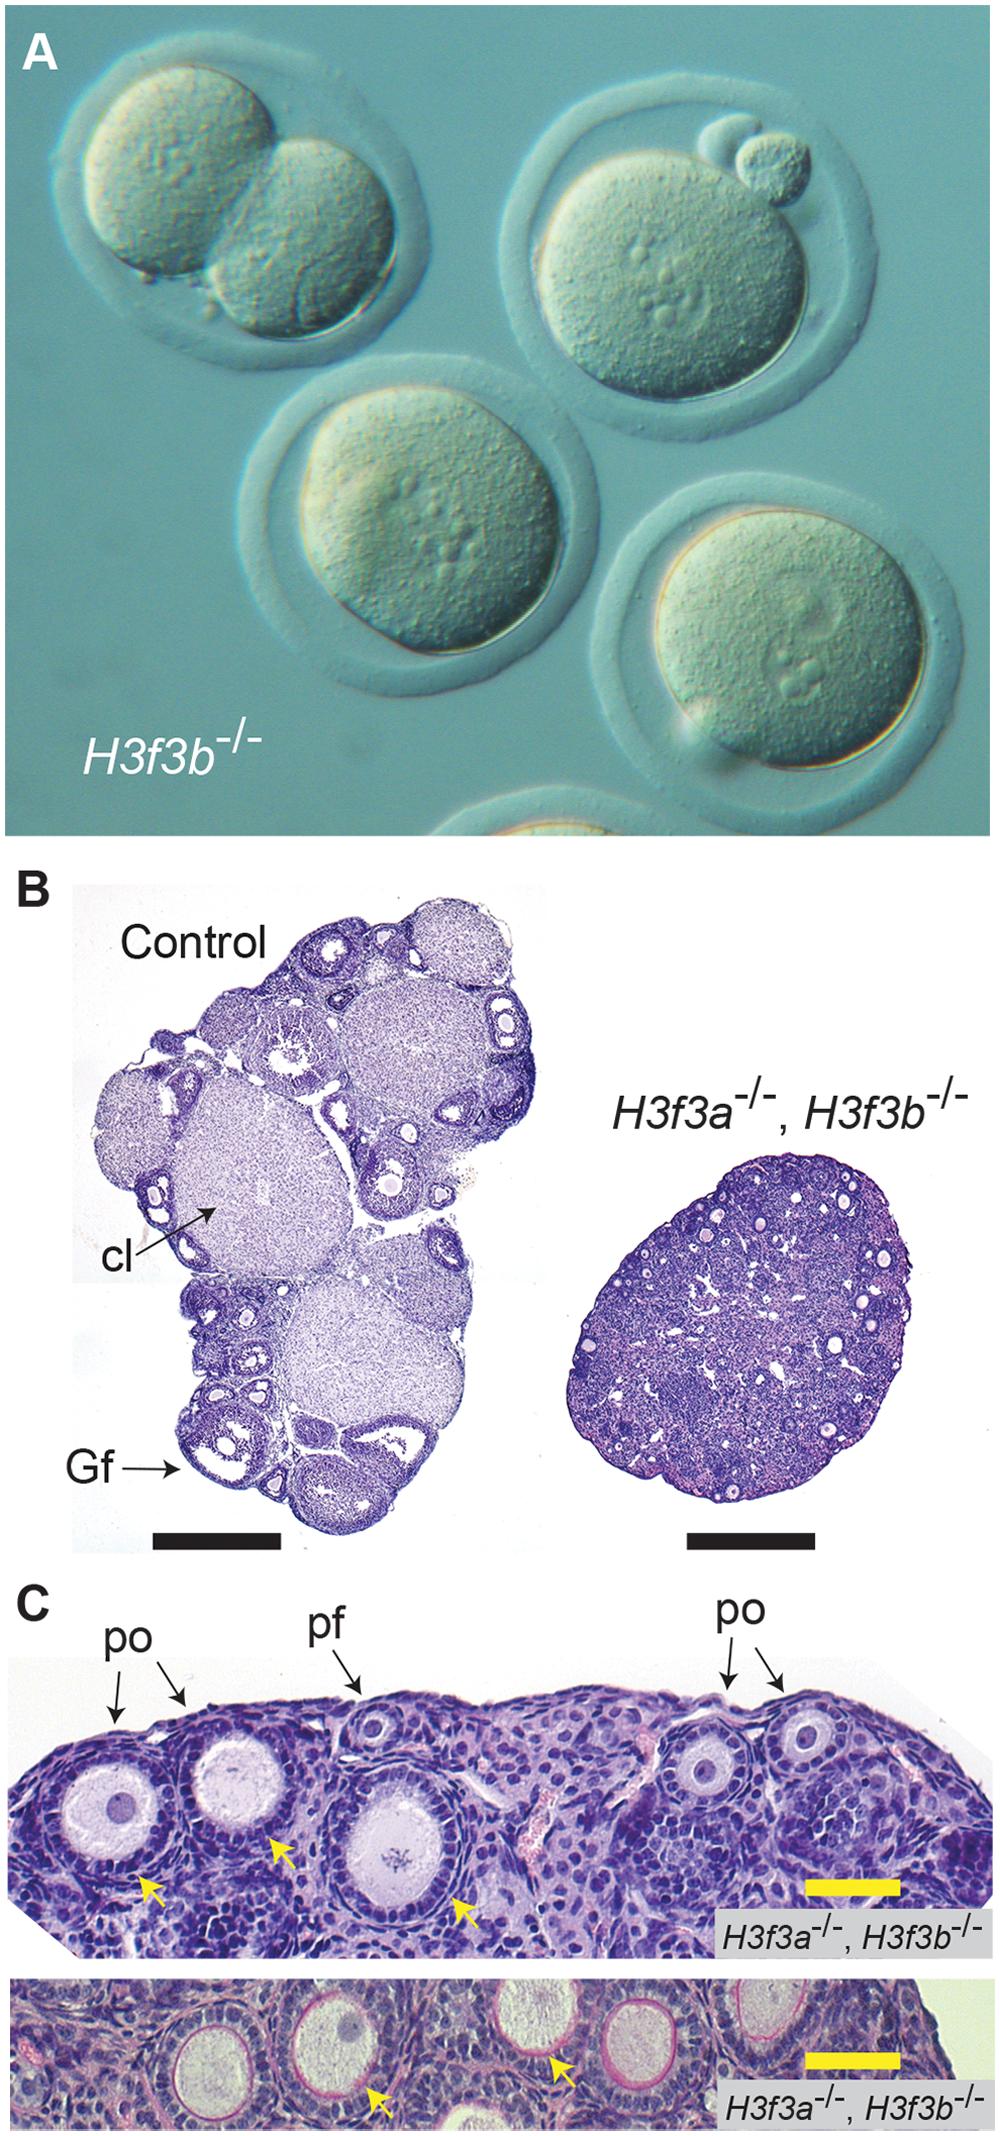 Developmental potential of <i>H3f3b</i> mutant zygotes, and <i>H3f3a</i>, <i>H3f3b</i> double-mutant follicles.